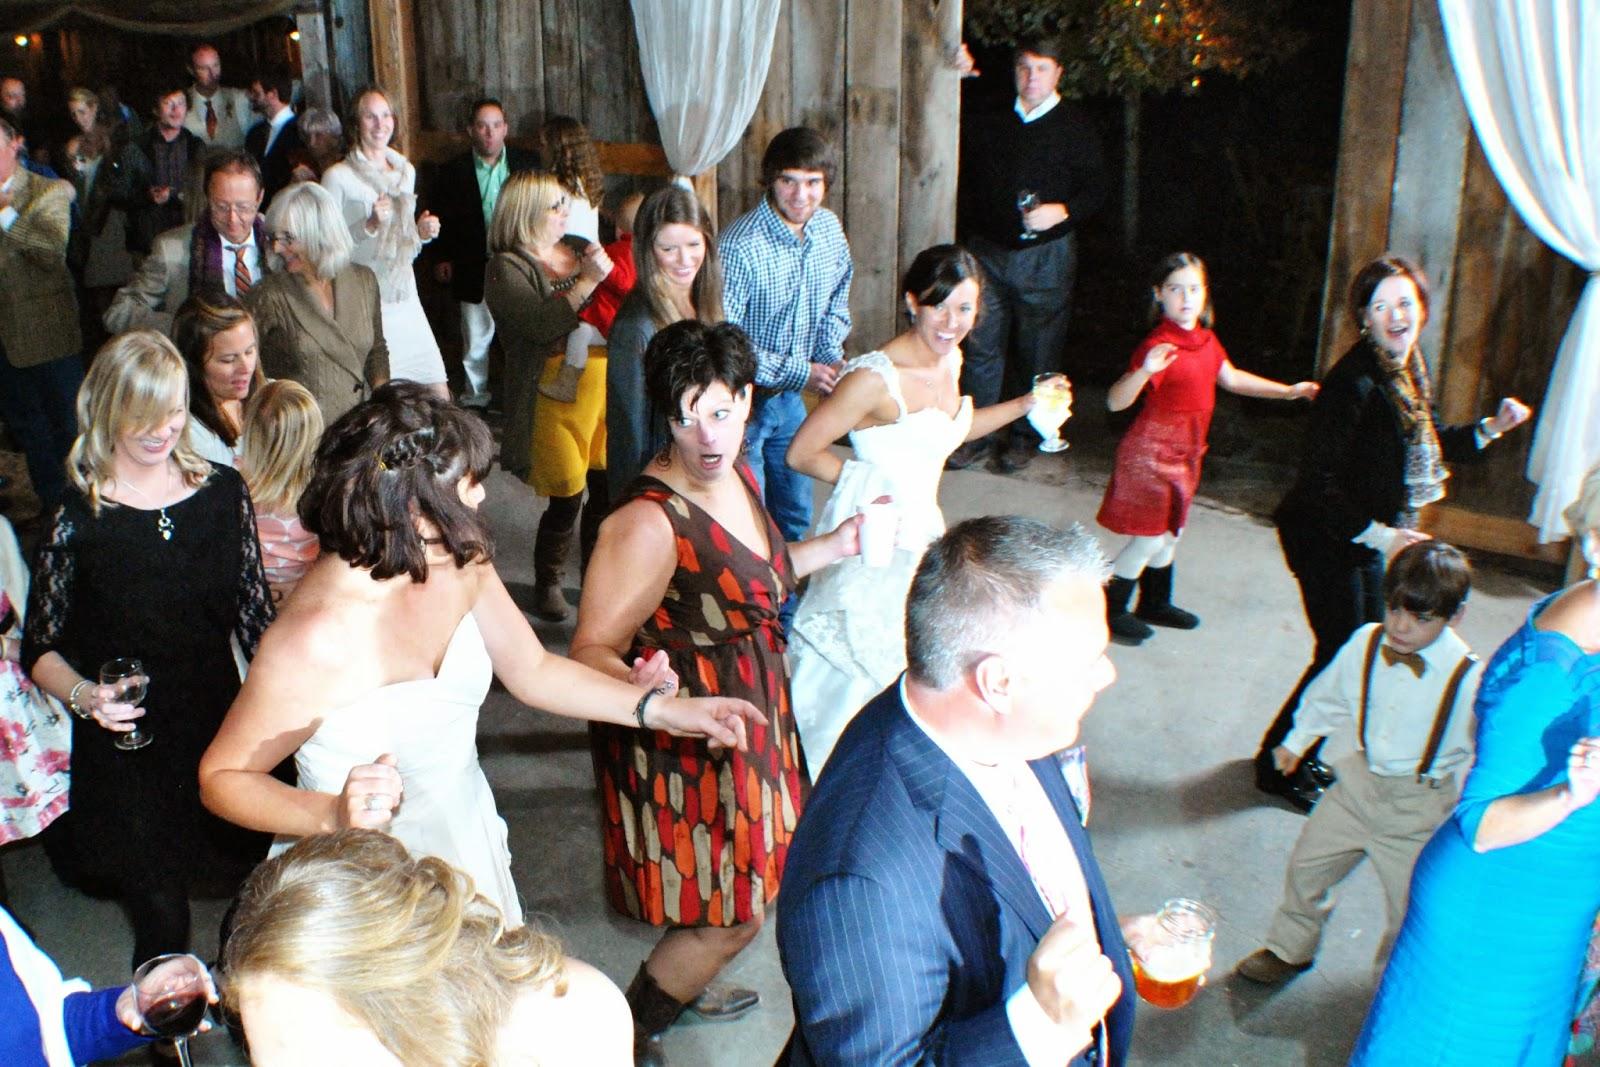 With Class LLC Wedding Coordination Party DJ - The Barn at High Point Farm - Flintstone, GA